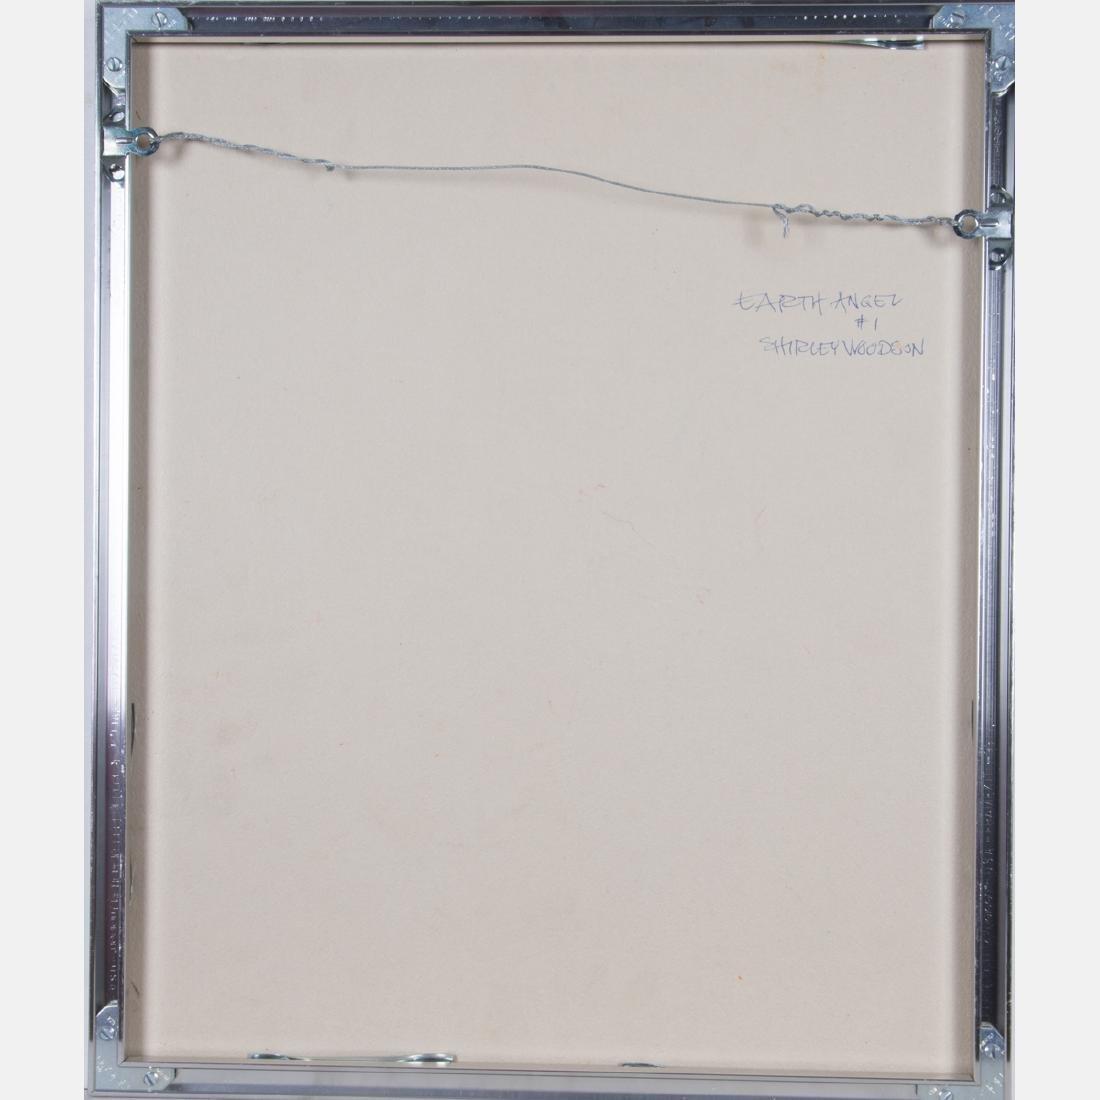 Shirley Woodson (20th Century) Earth Angel Series, - 4